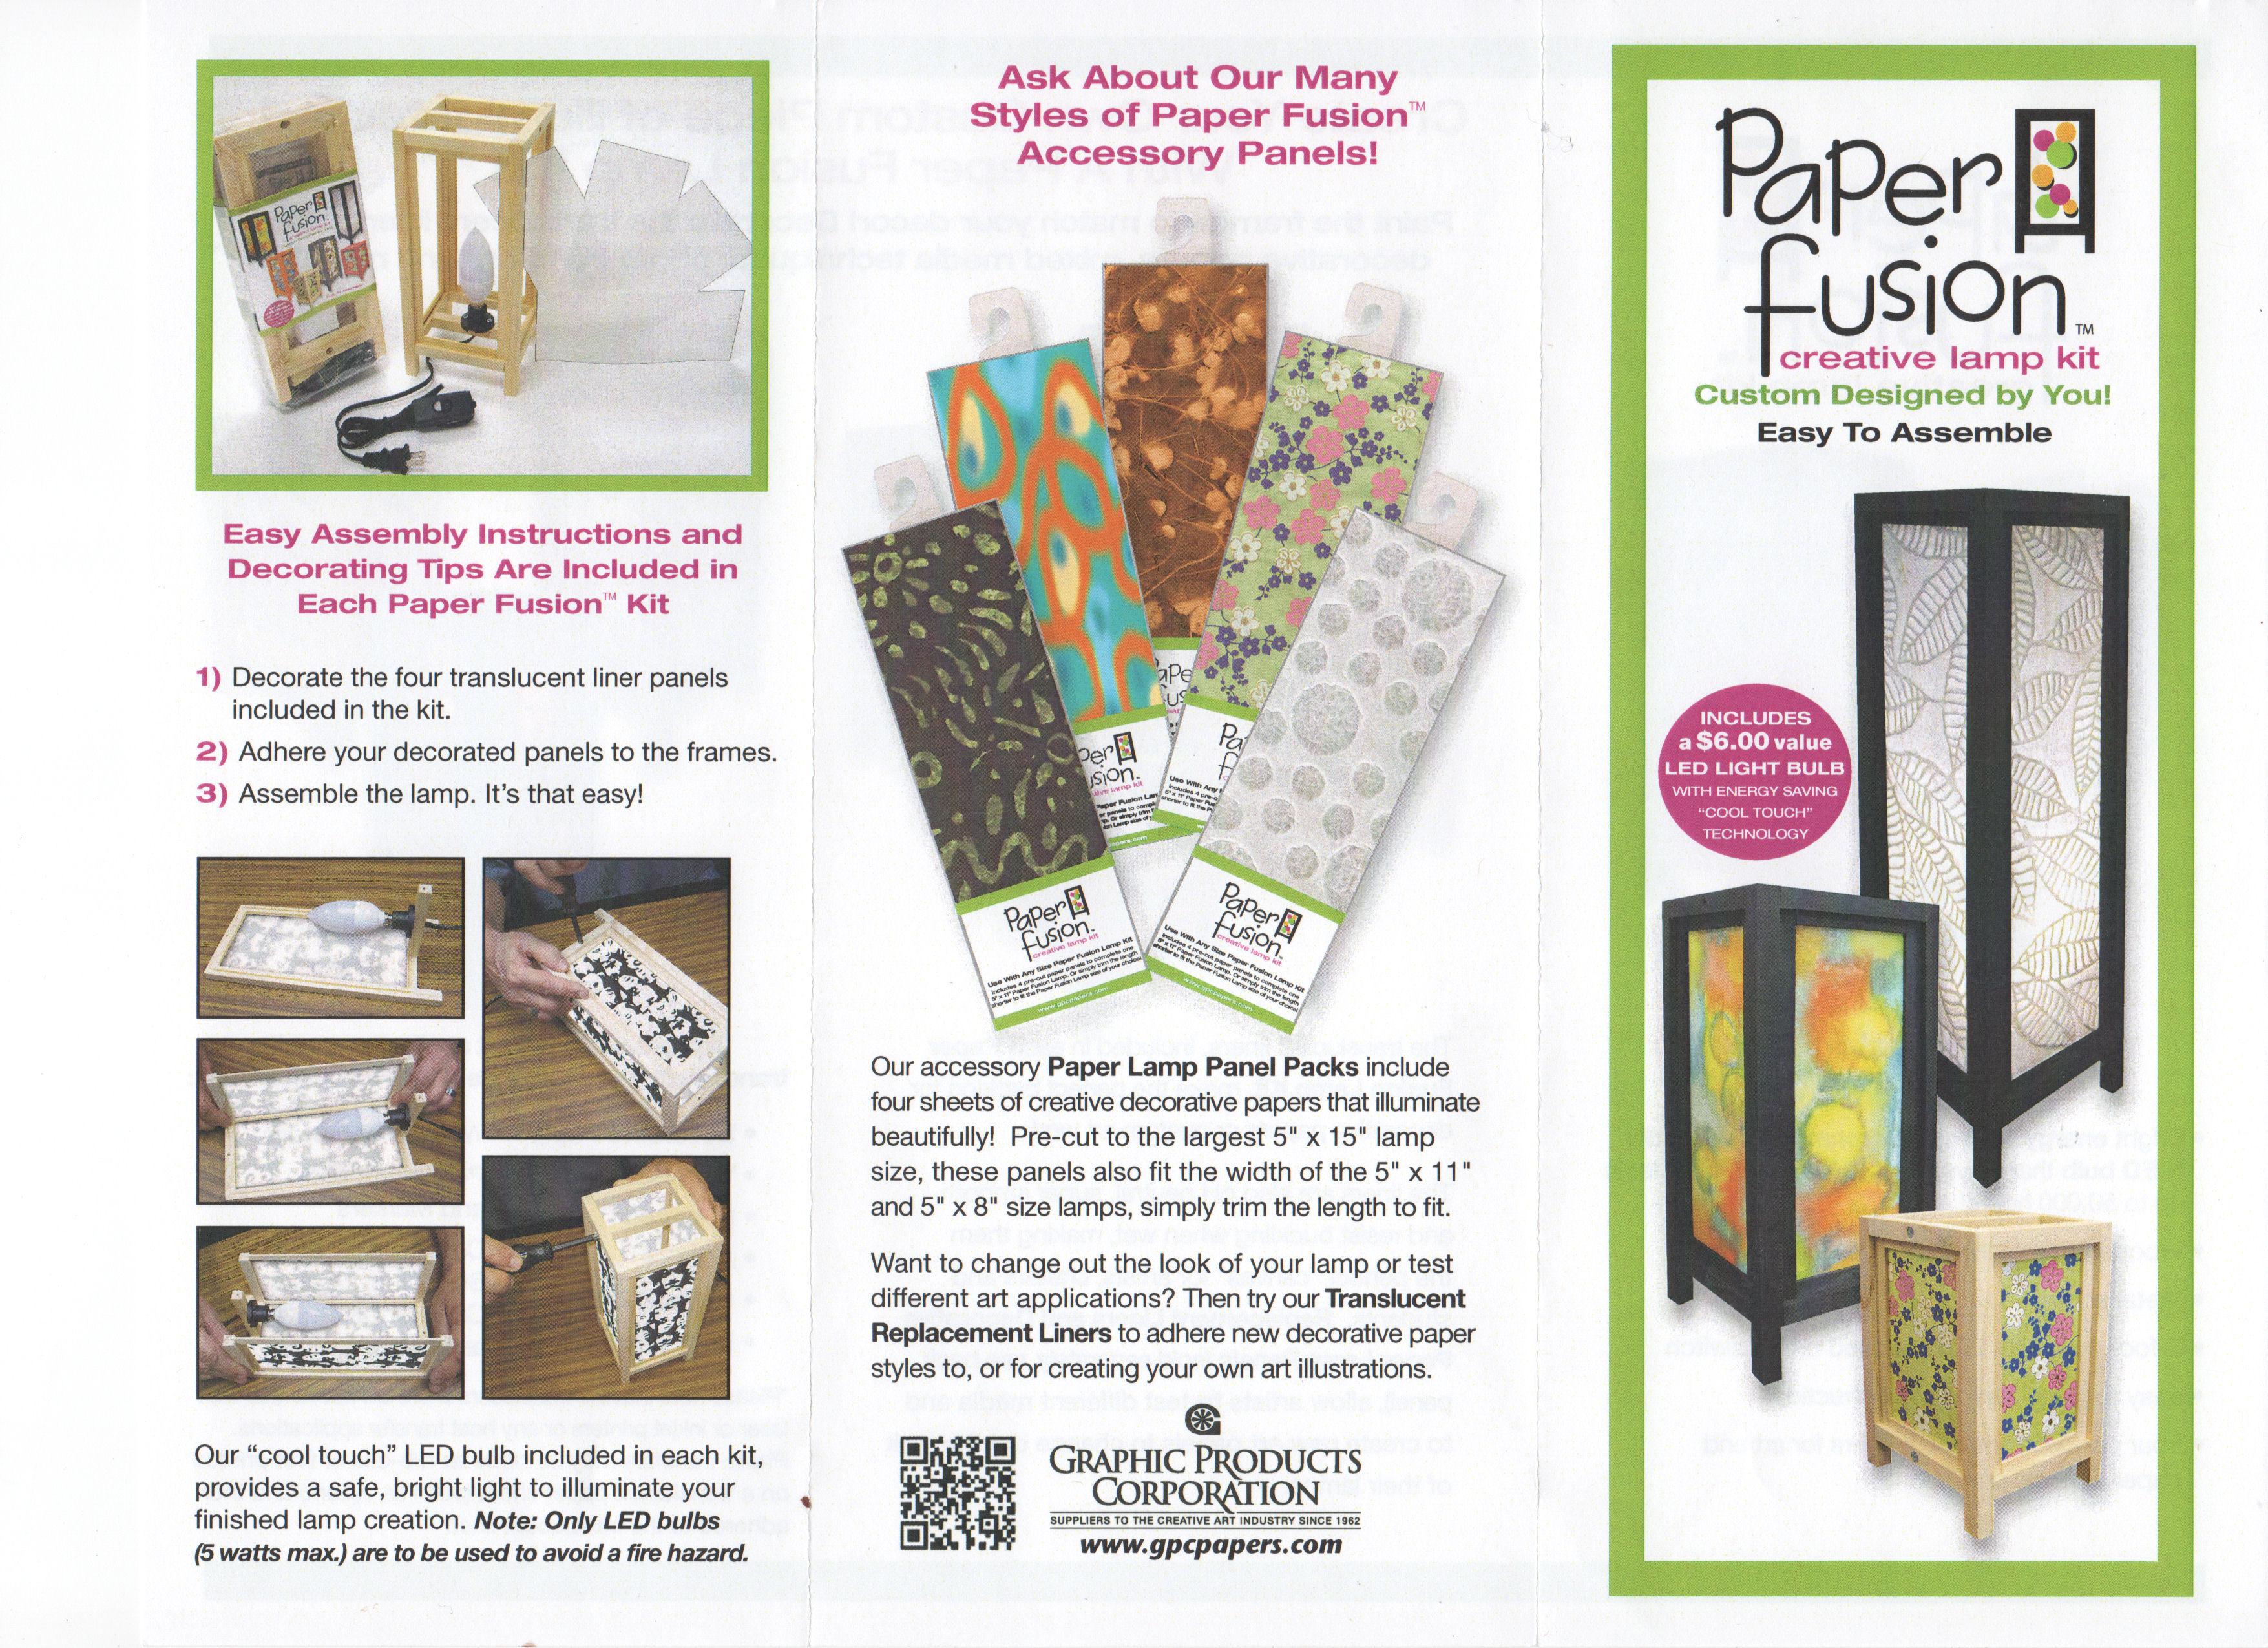 da-paper-fusion-lamp-kit-brochure-page-1.jpg